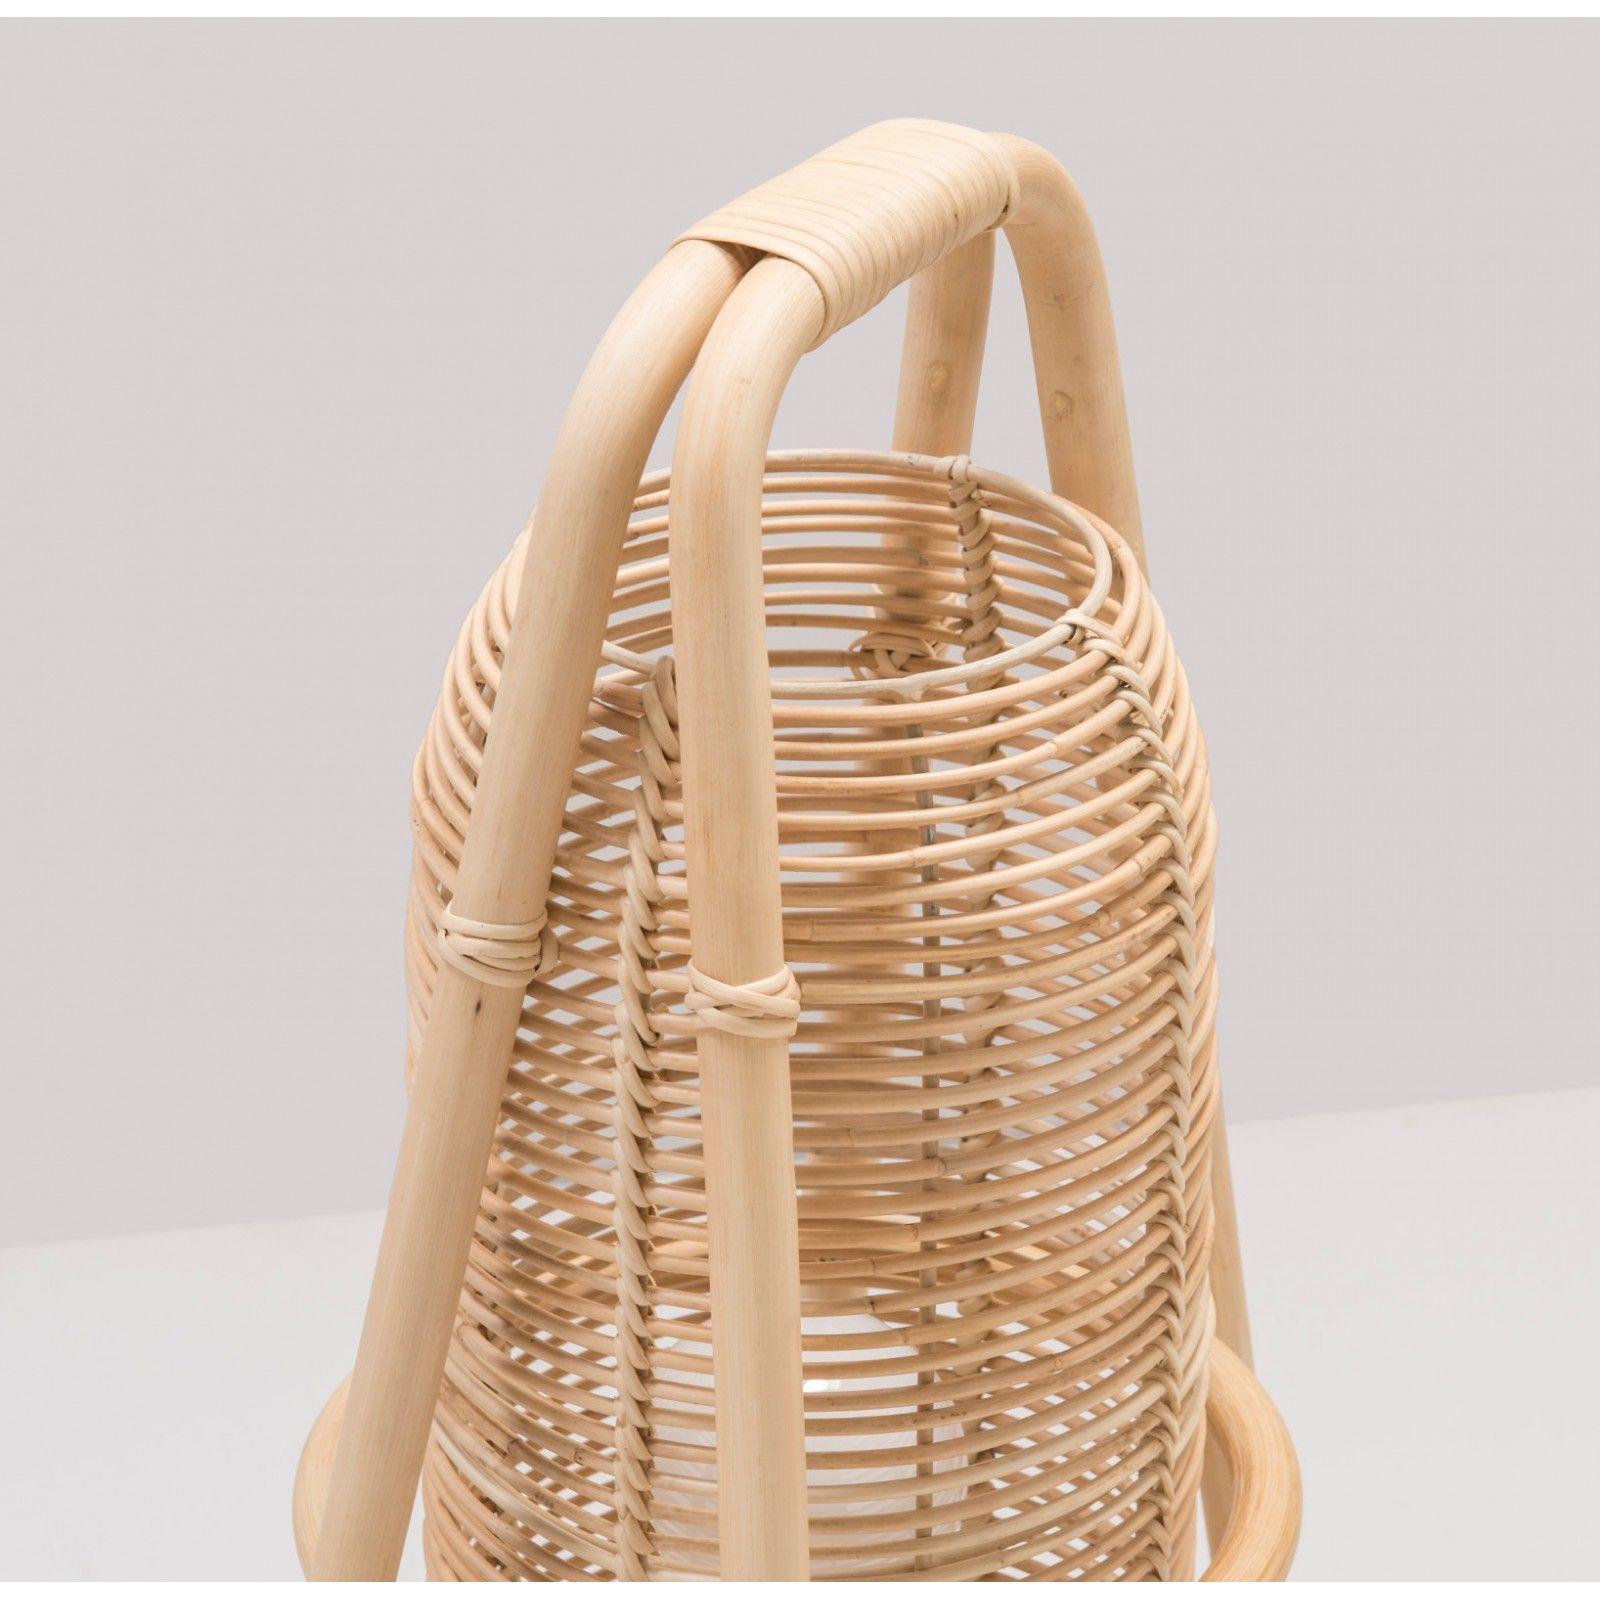 À En Nacelle Lampe Design Poser 2019Products Rotin kZOPXiu